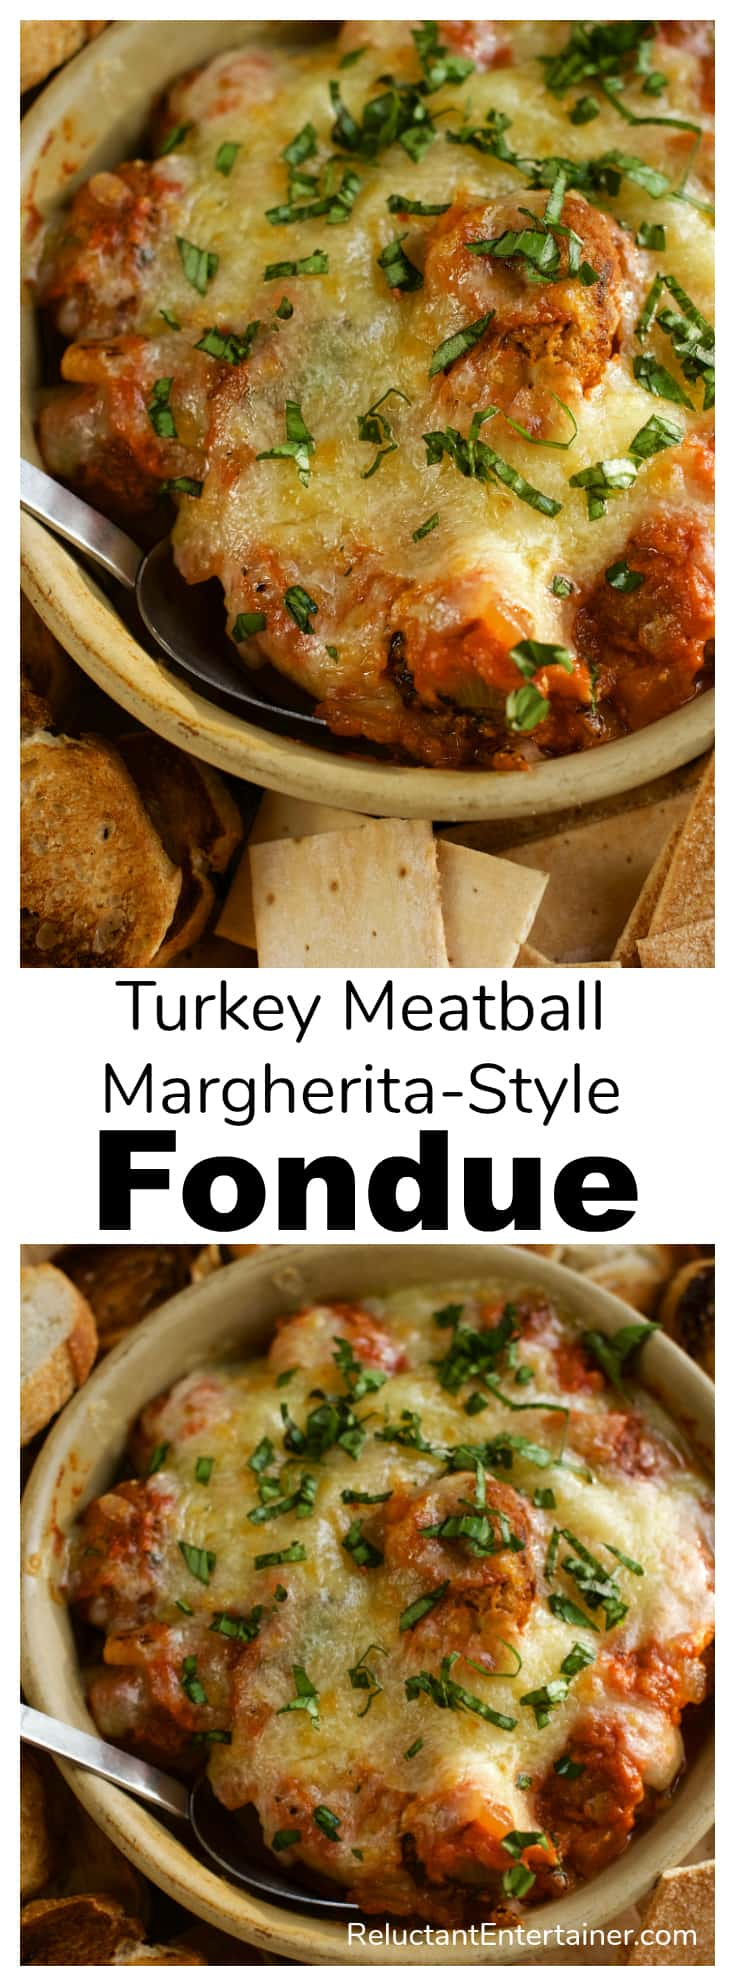 Turkey Meatball Margherita-Style Fondue Recipe